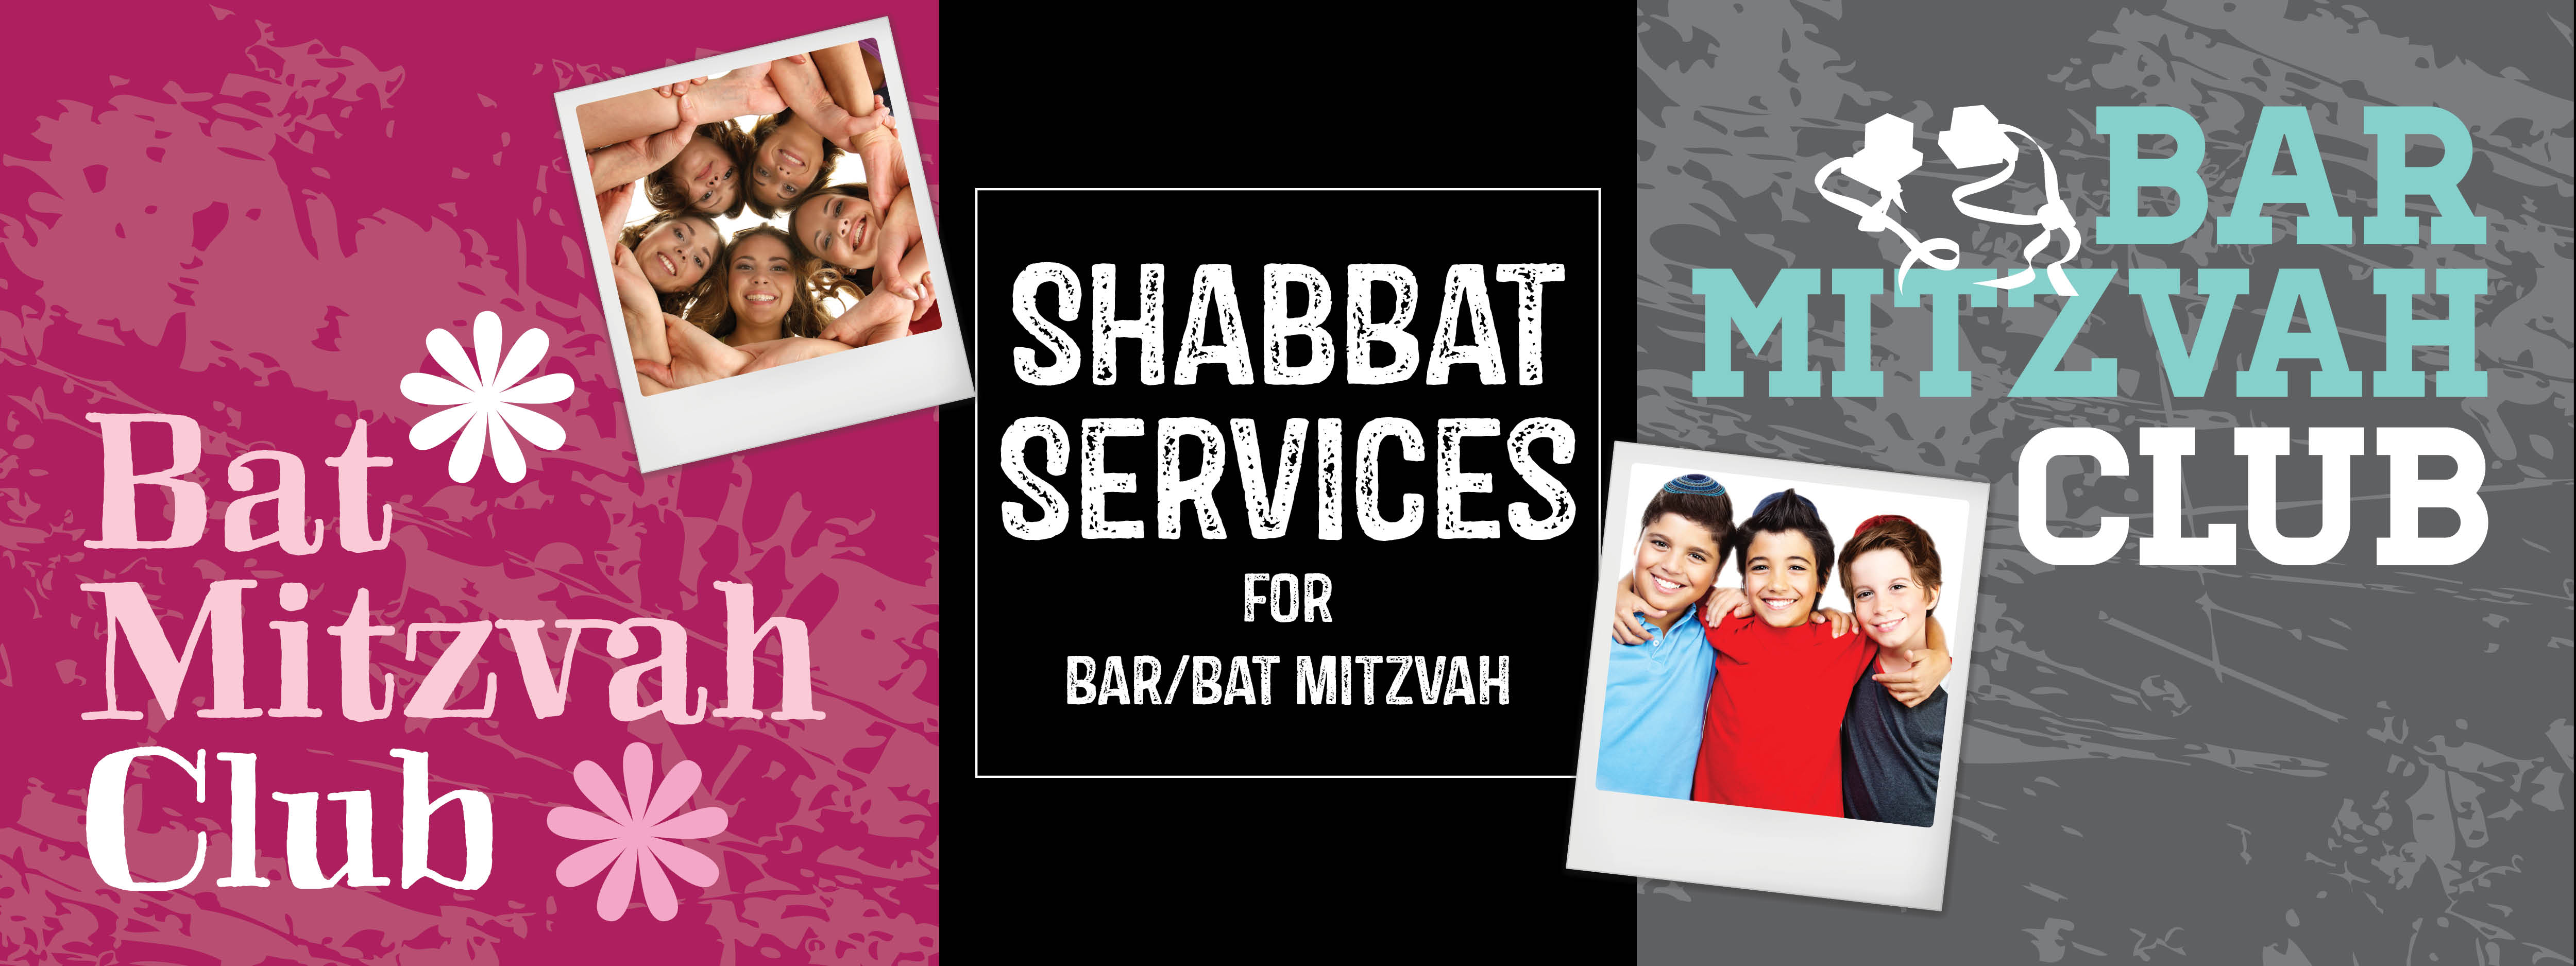 http://chabadshore.com/wp-content/uploads/2016/12/web-ads.jpg